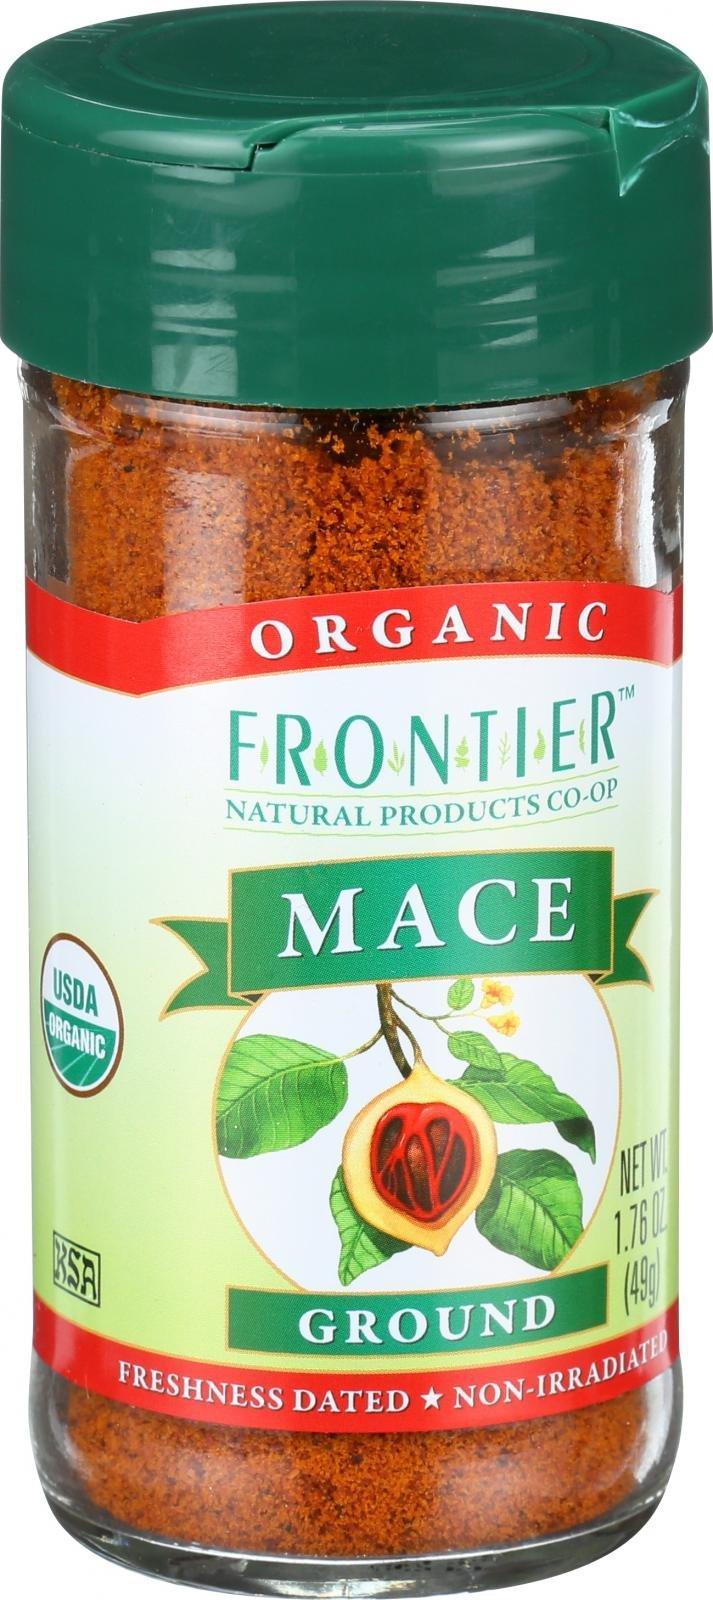 Frontier Herb - Organic Ground Mace - 1.76 oz - GMO Free - Kosher - Non Irradiated